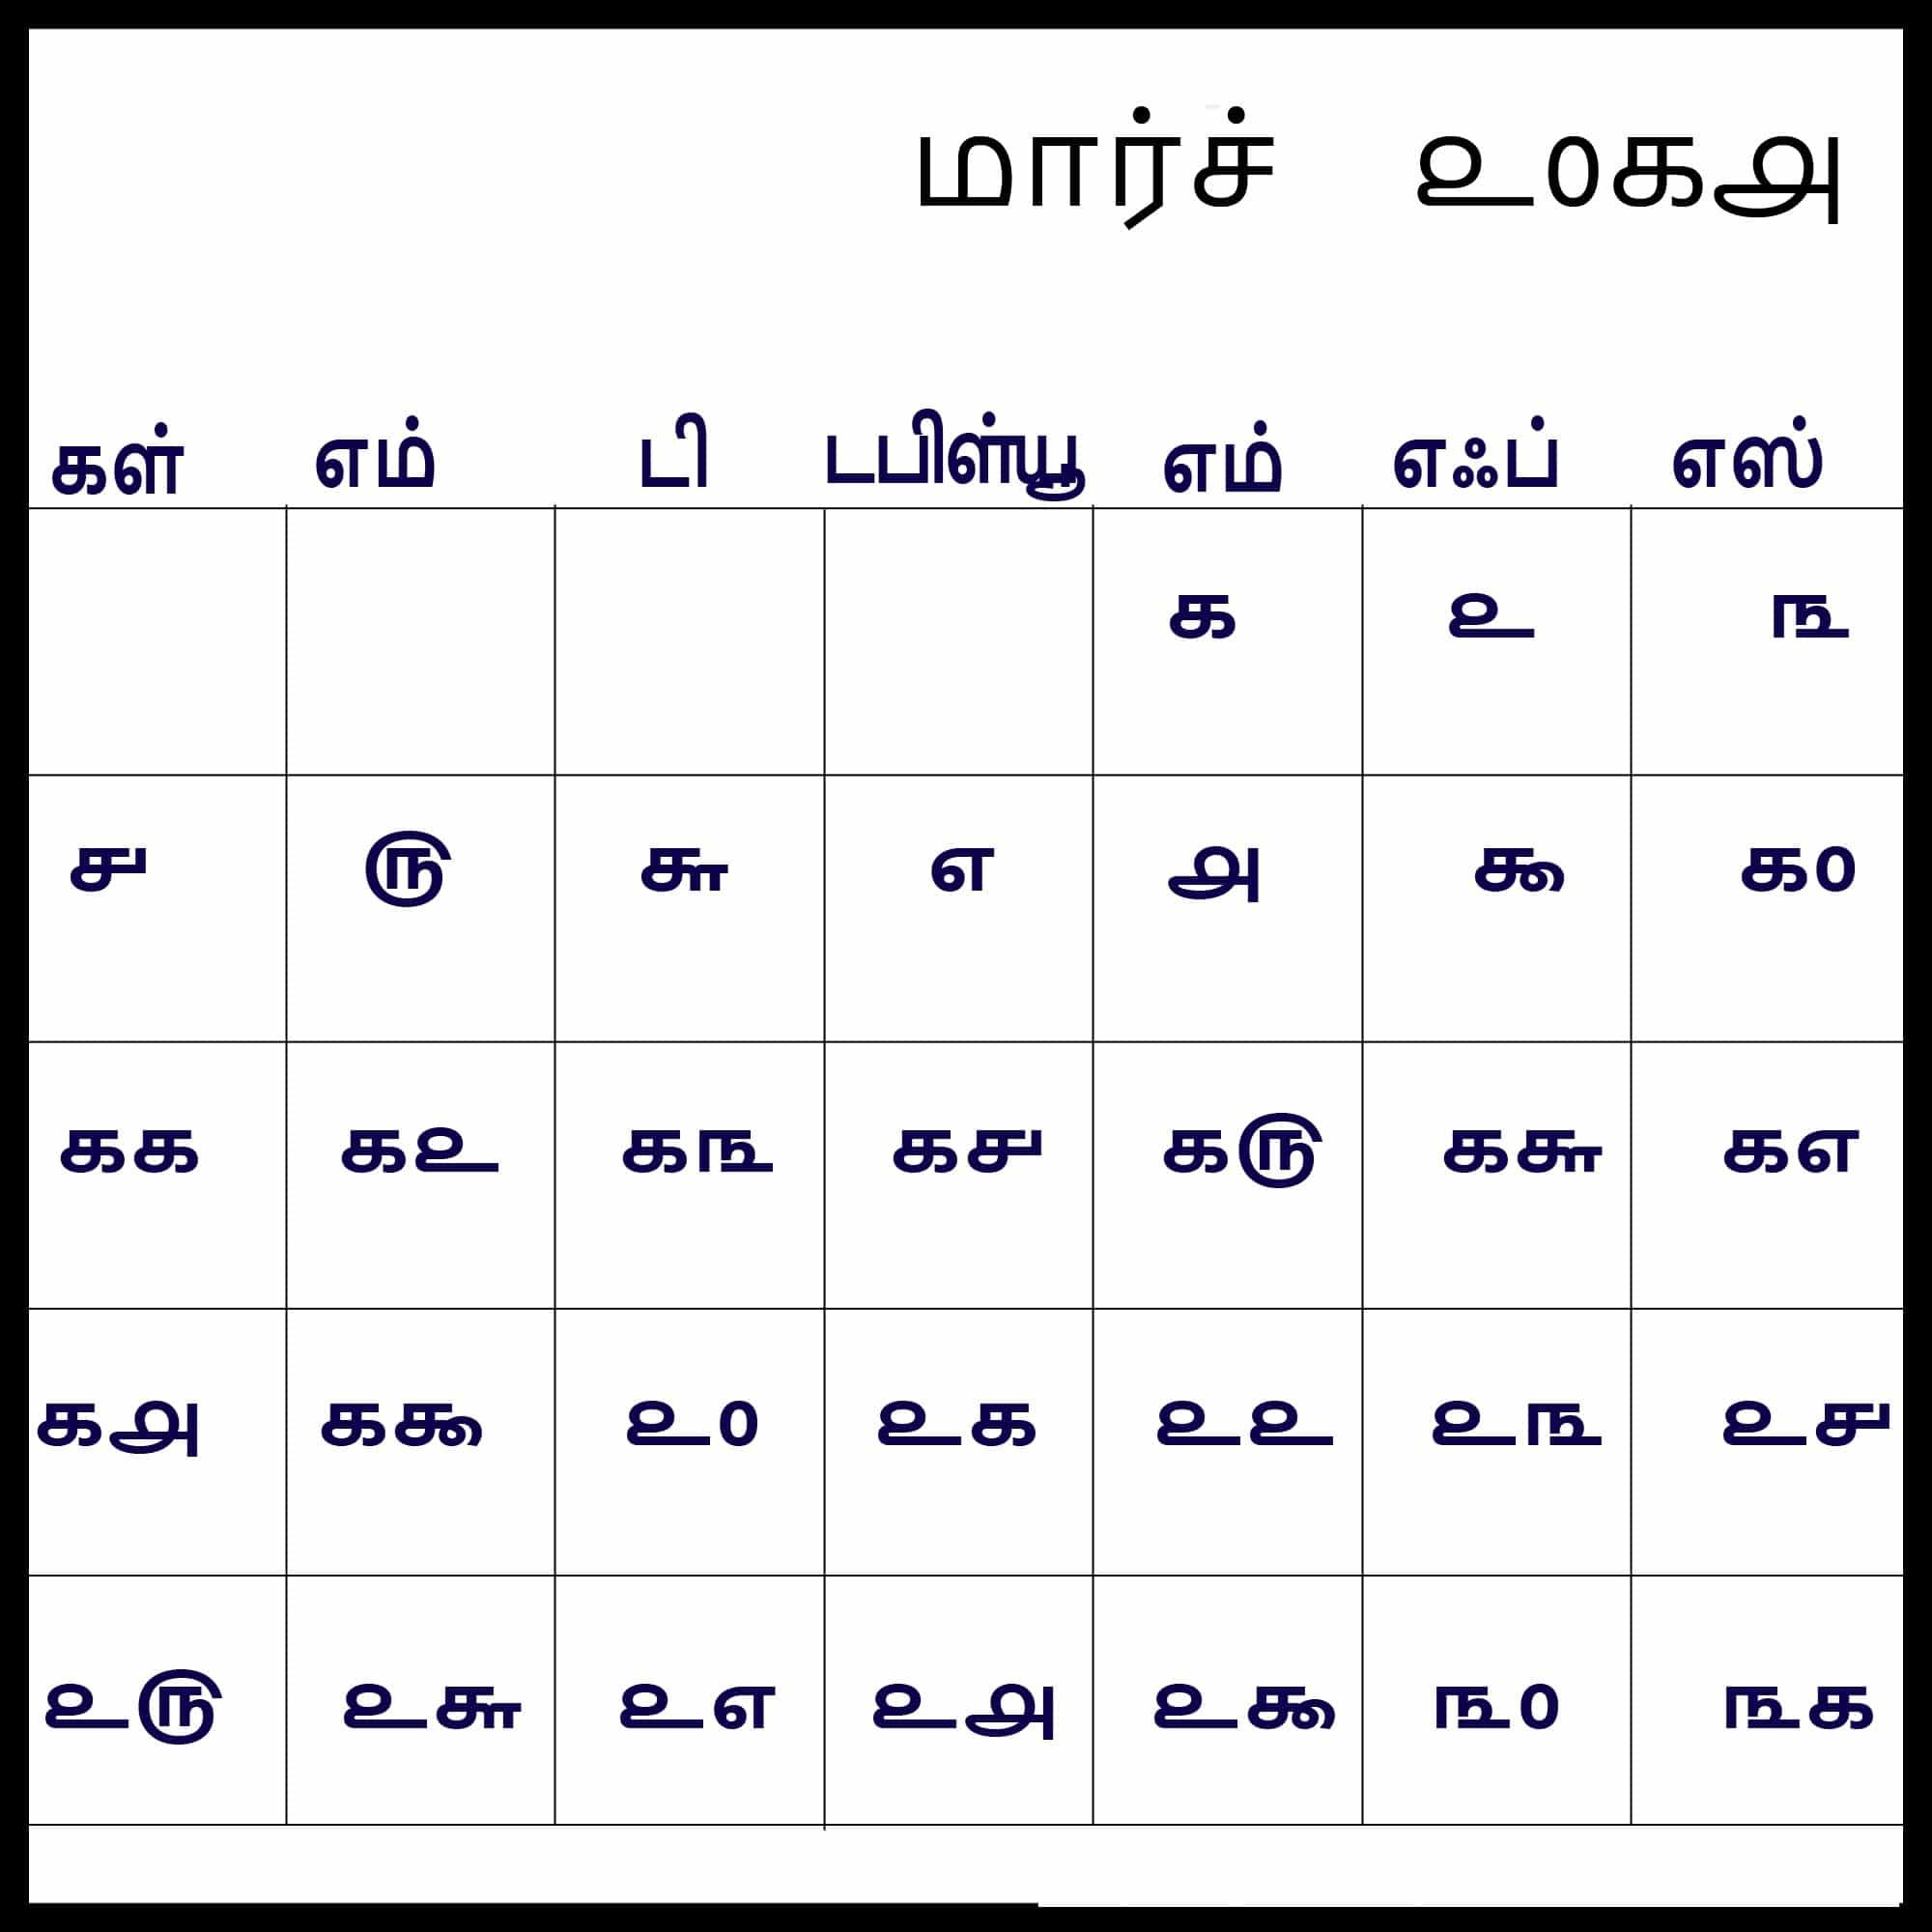 March 2018 tamil calendar printable pdf free free hd images tamil calendar 2018 march urtaz Images